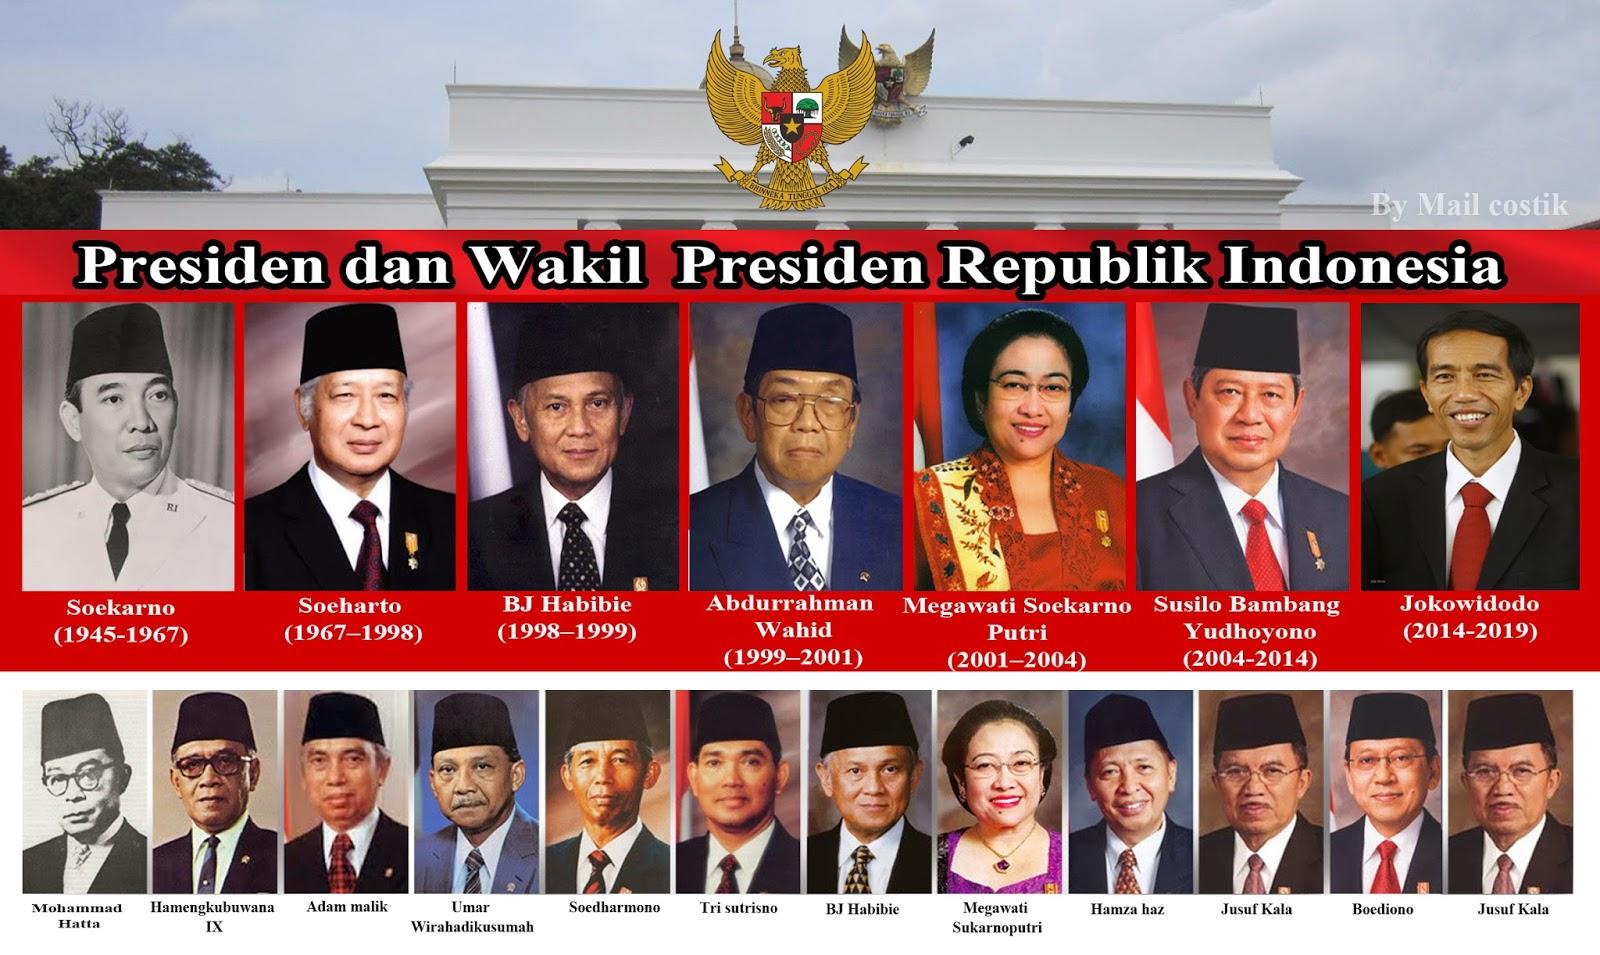 Daftar Nama Presiden dan Wakil Presiden di Indonesia + Gambar